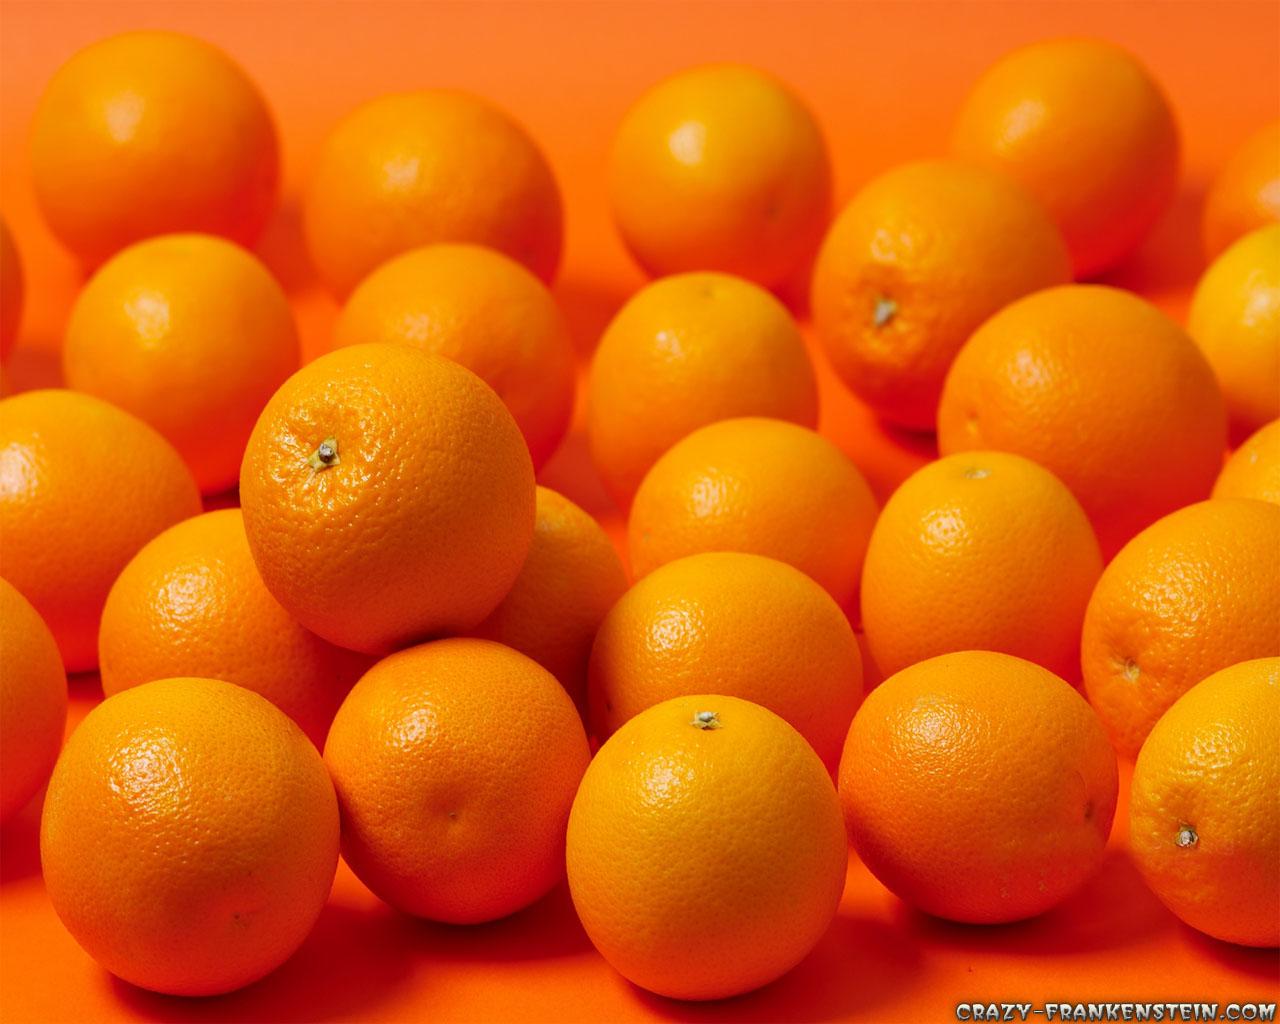 Or orange fruit hd wallpaper - Tesco Orange Juice Carton Kootation